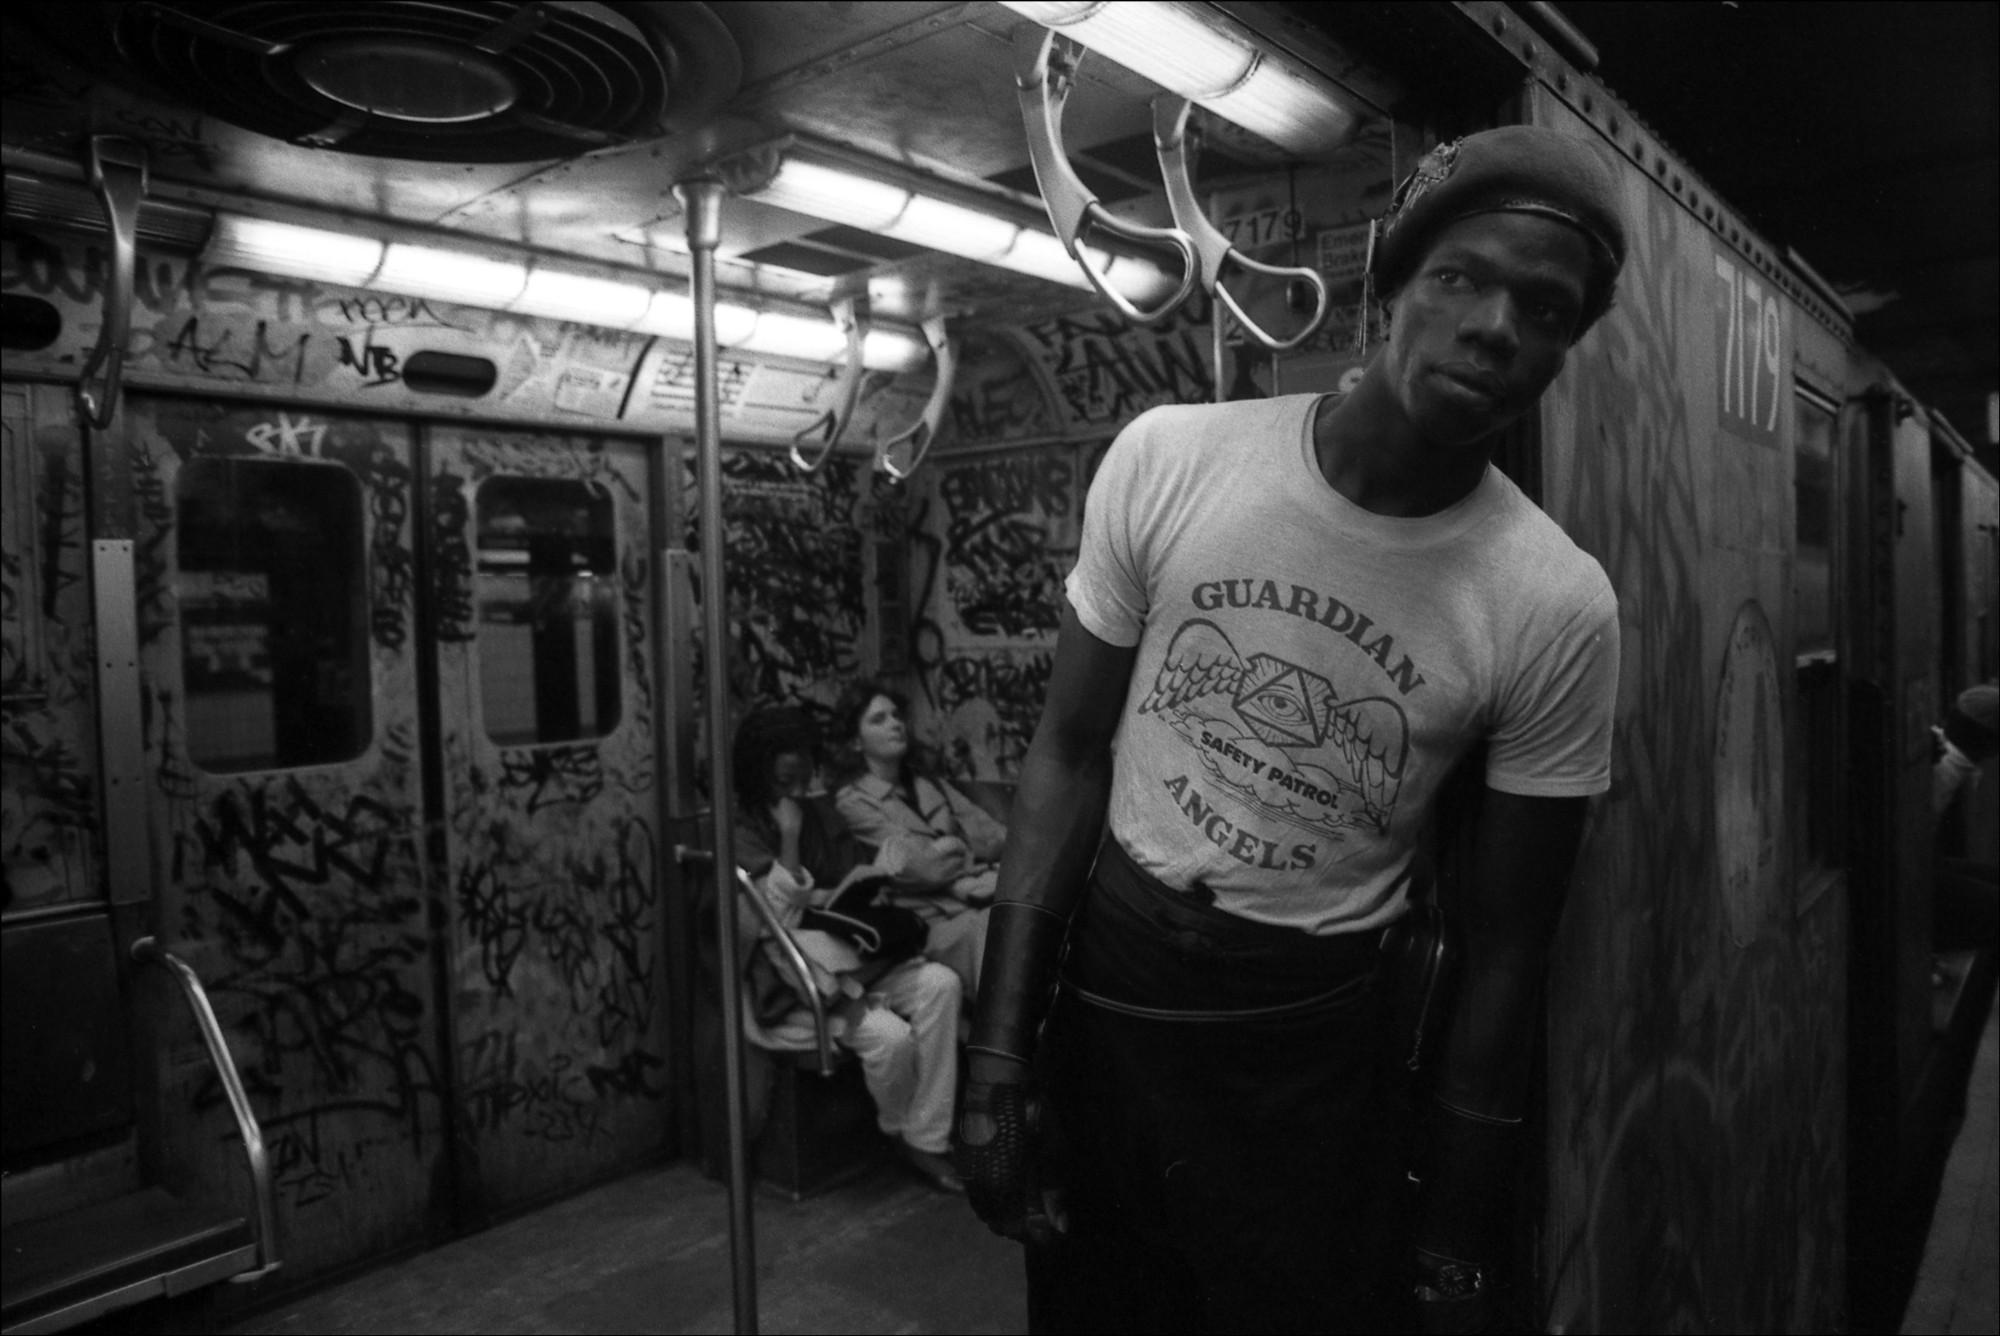 Guardian Angels, Activist, African American Activist, KOLUMN Magazine, KOLUMN